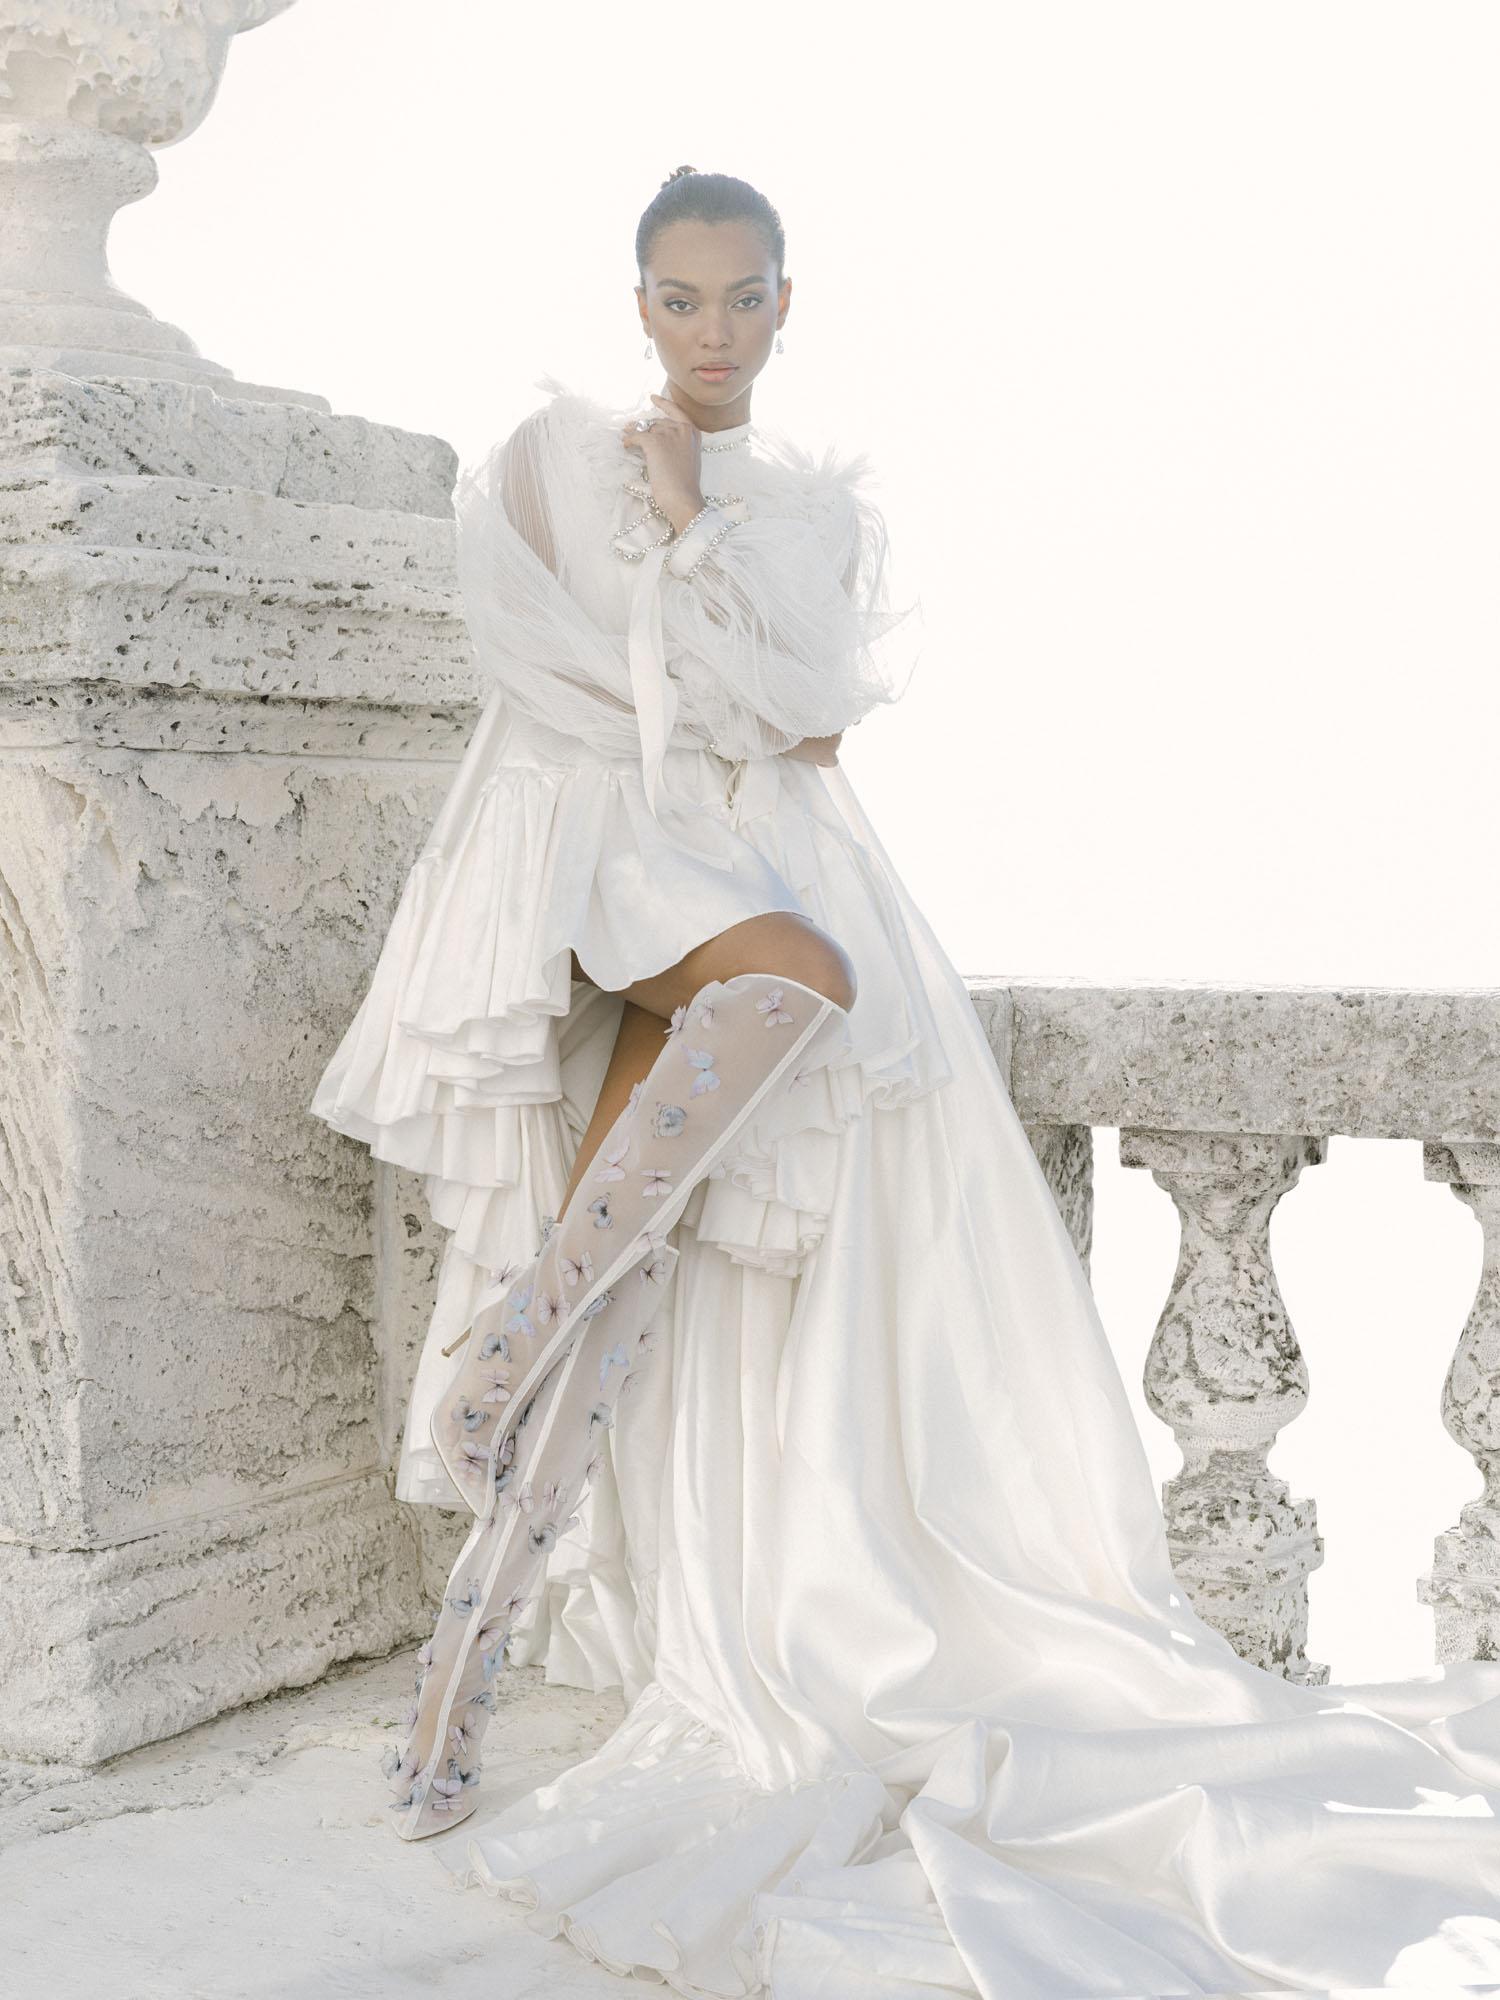 Thigh bridal boots